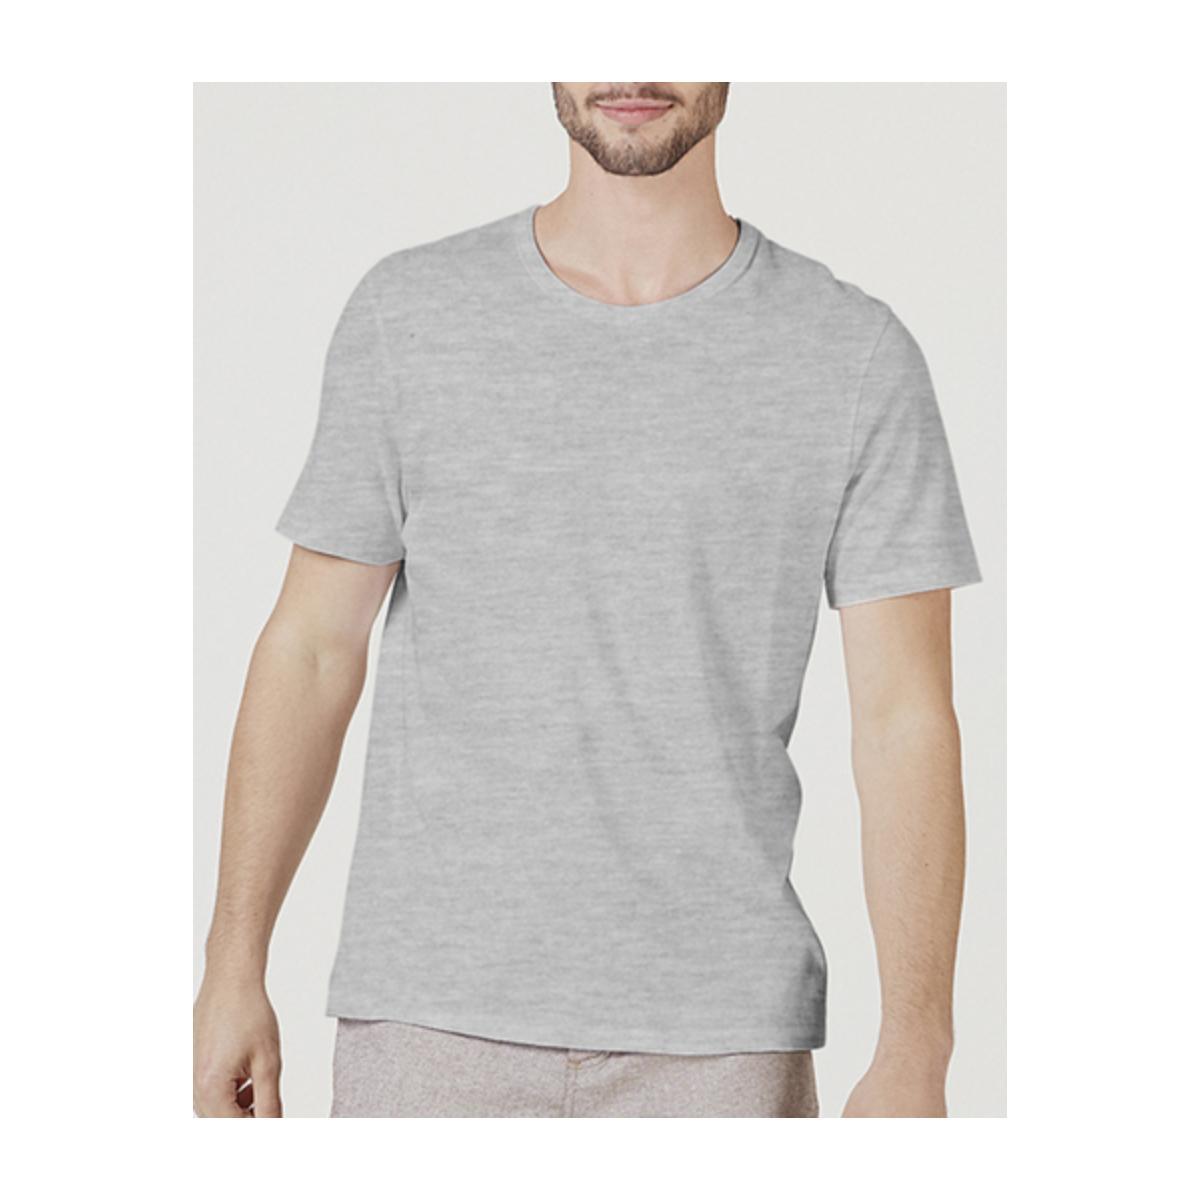 Camiseta Masculina Hering 0299 M2h07s Mescla